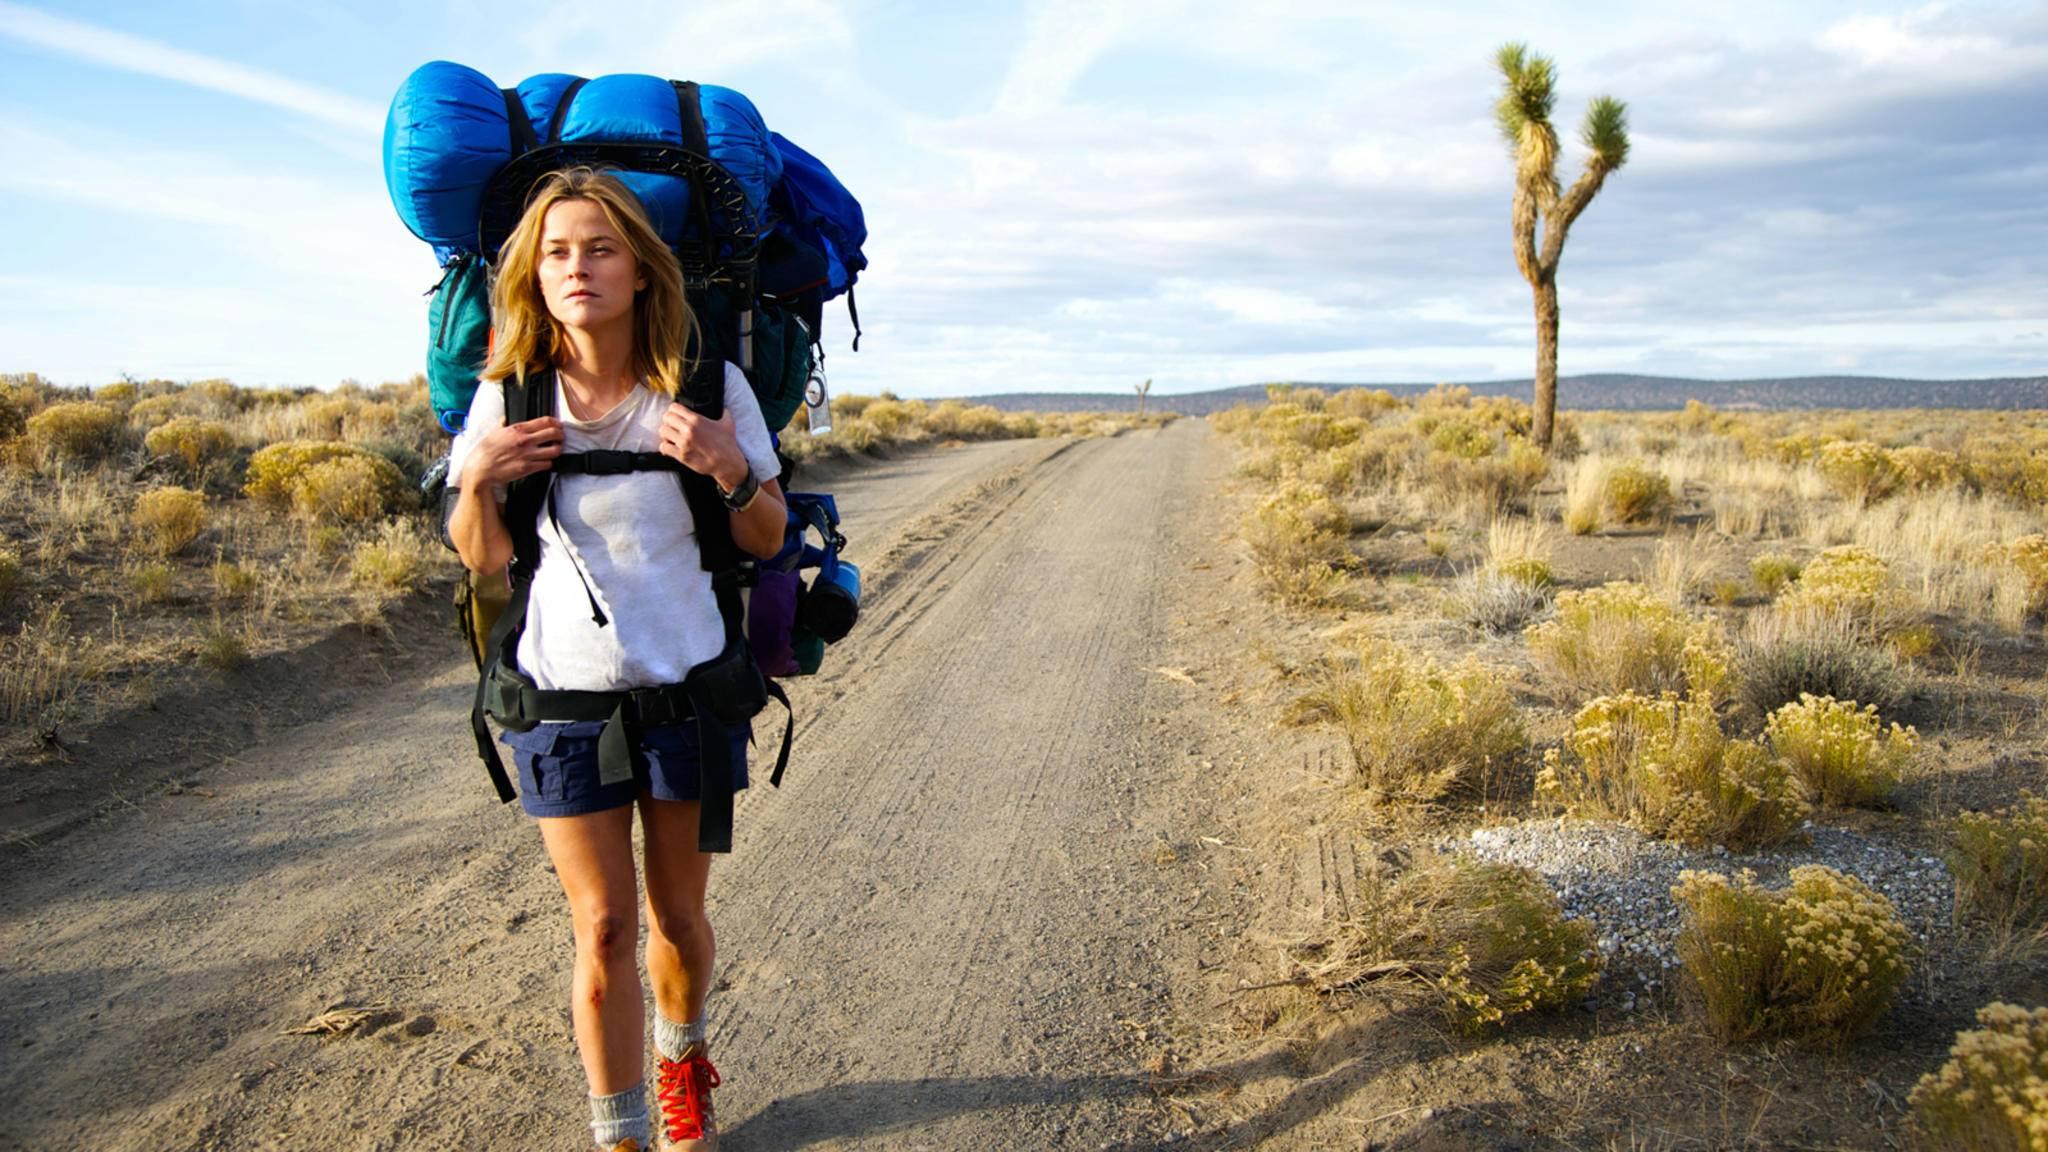 Der große Trip – Wild Reese Witherspoon